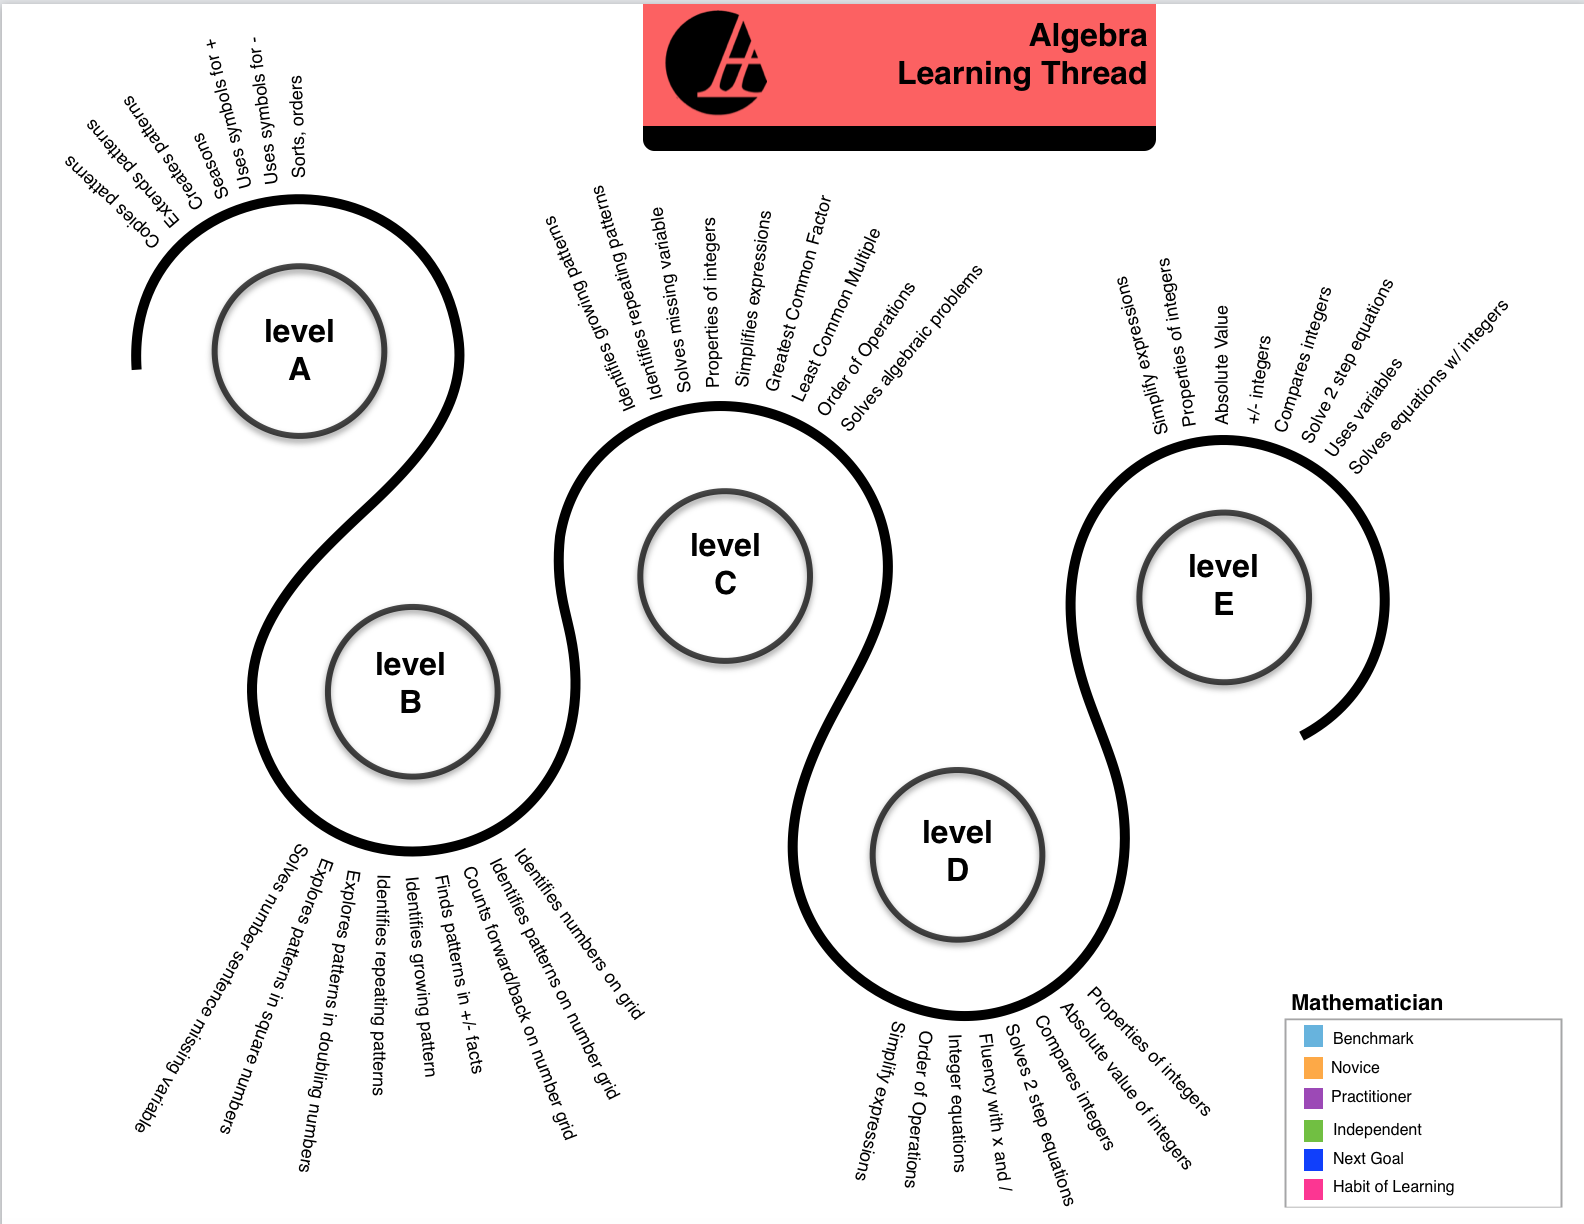 Anastasis Academy Algebra Learning Thread created by Kelly Tenkely